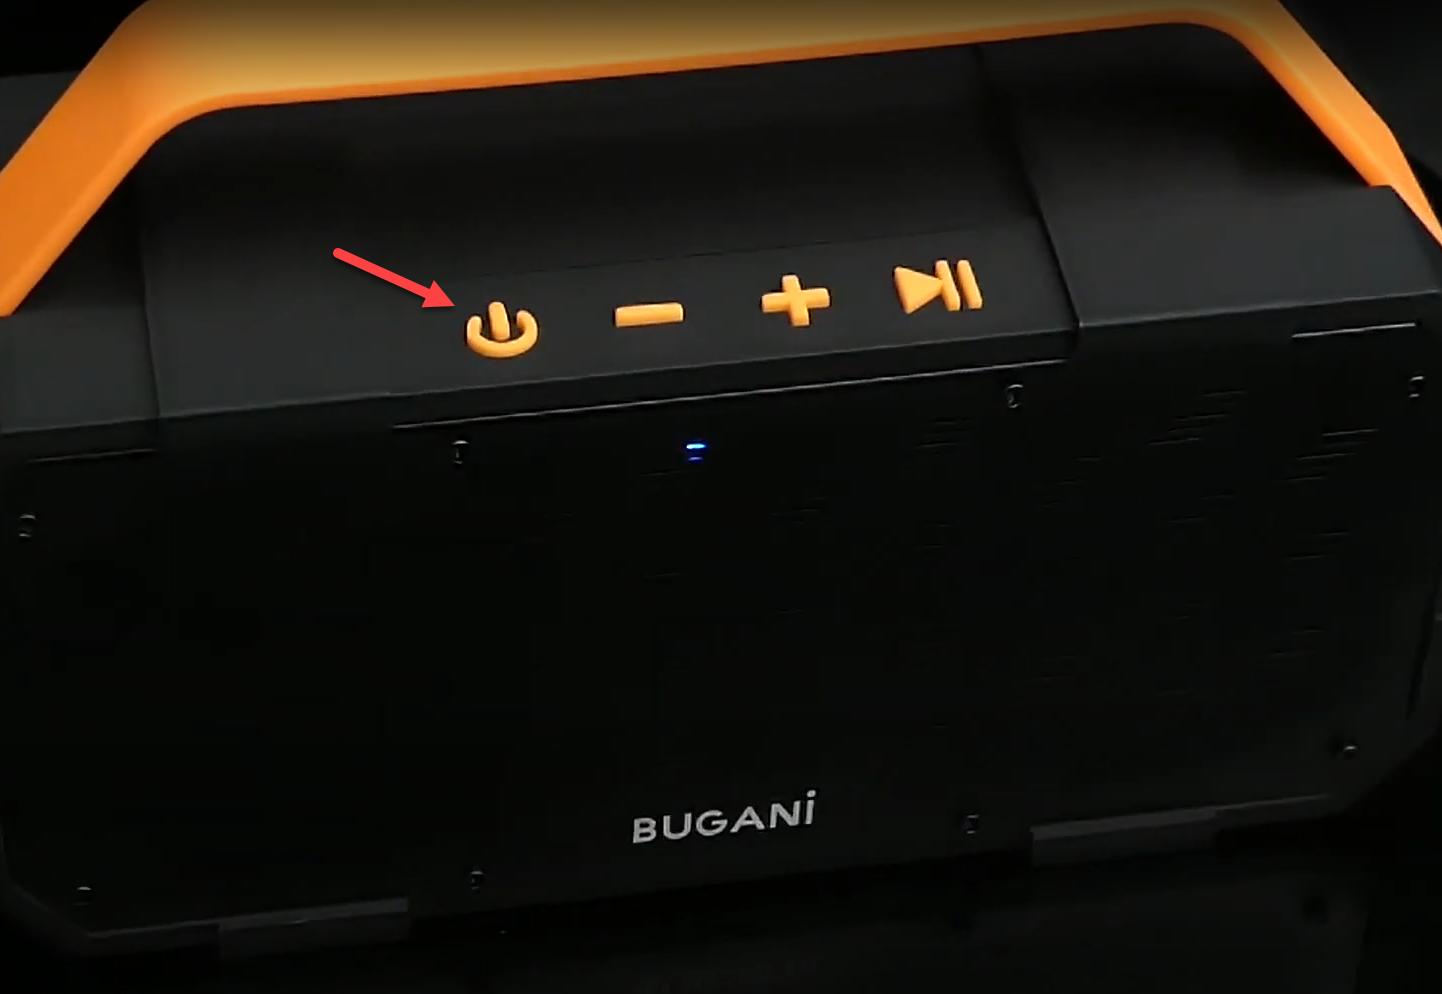 Bugani M90 Bluetooth Not Working Problem